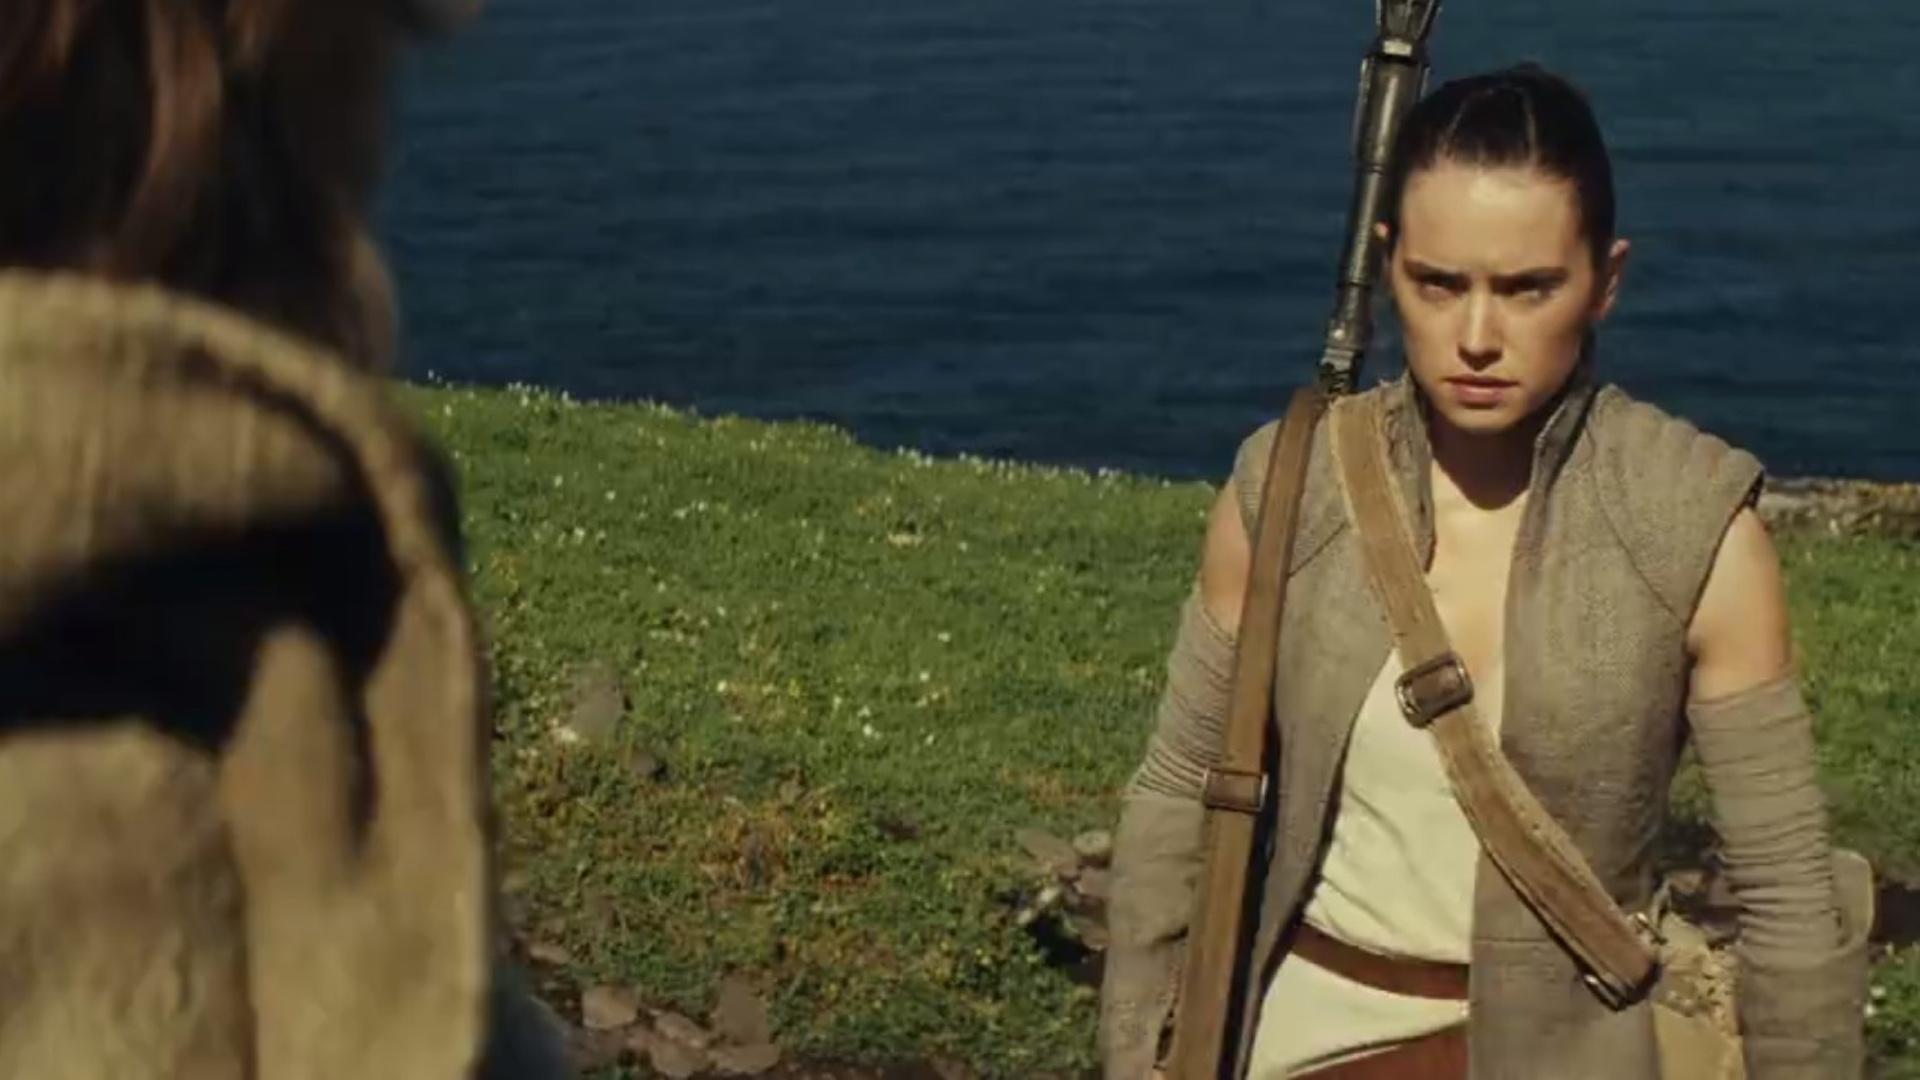 c2a67f5bfafb71 STAR WARS Star Daisy Ridley Could Play Lara Croft in TOMB ...